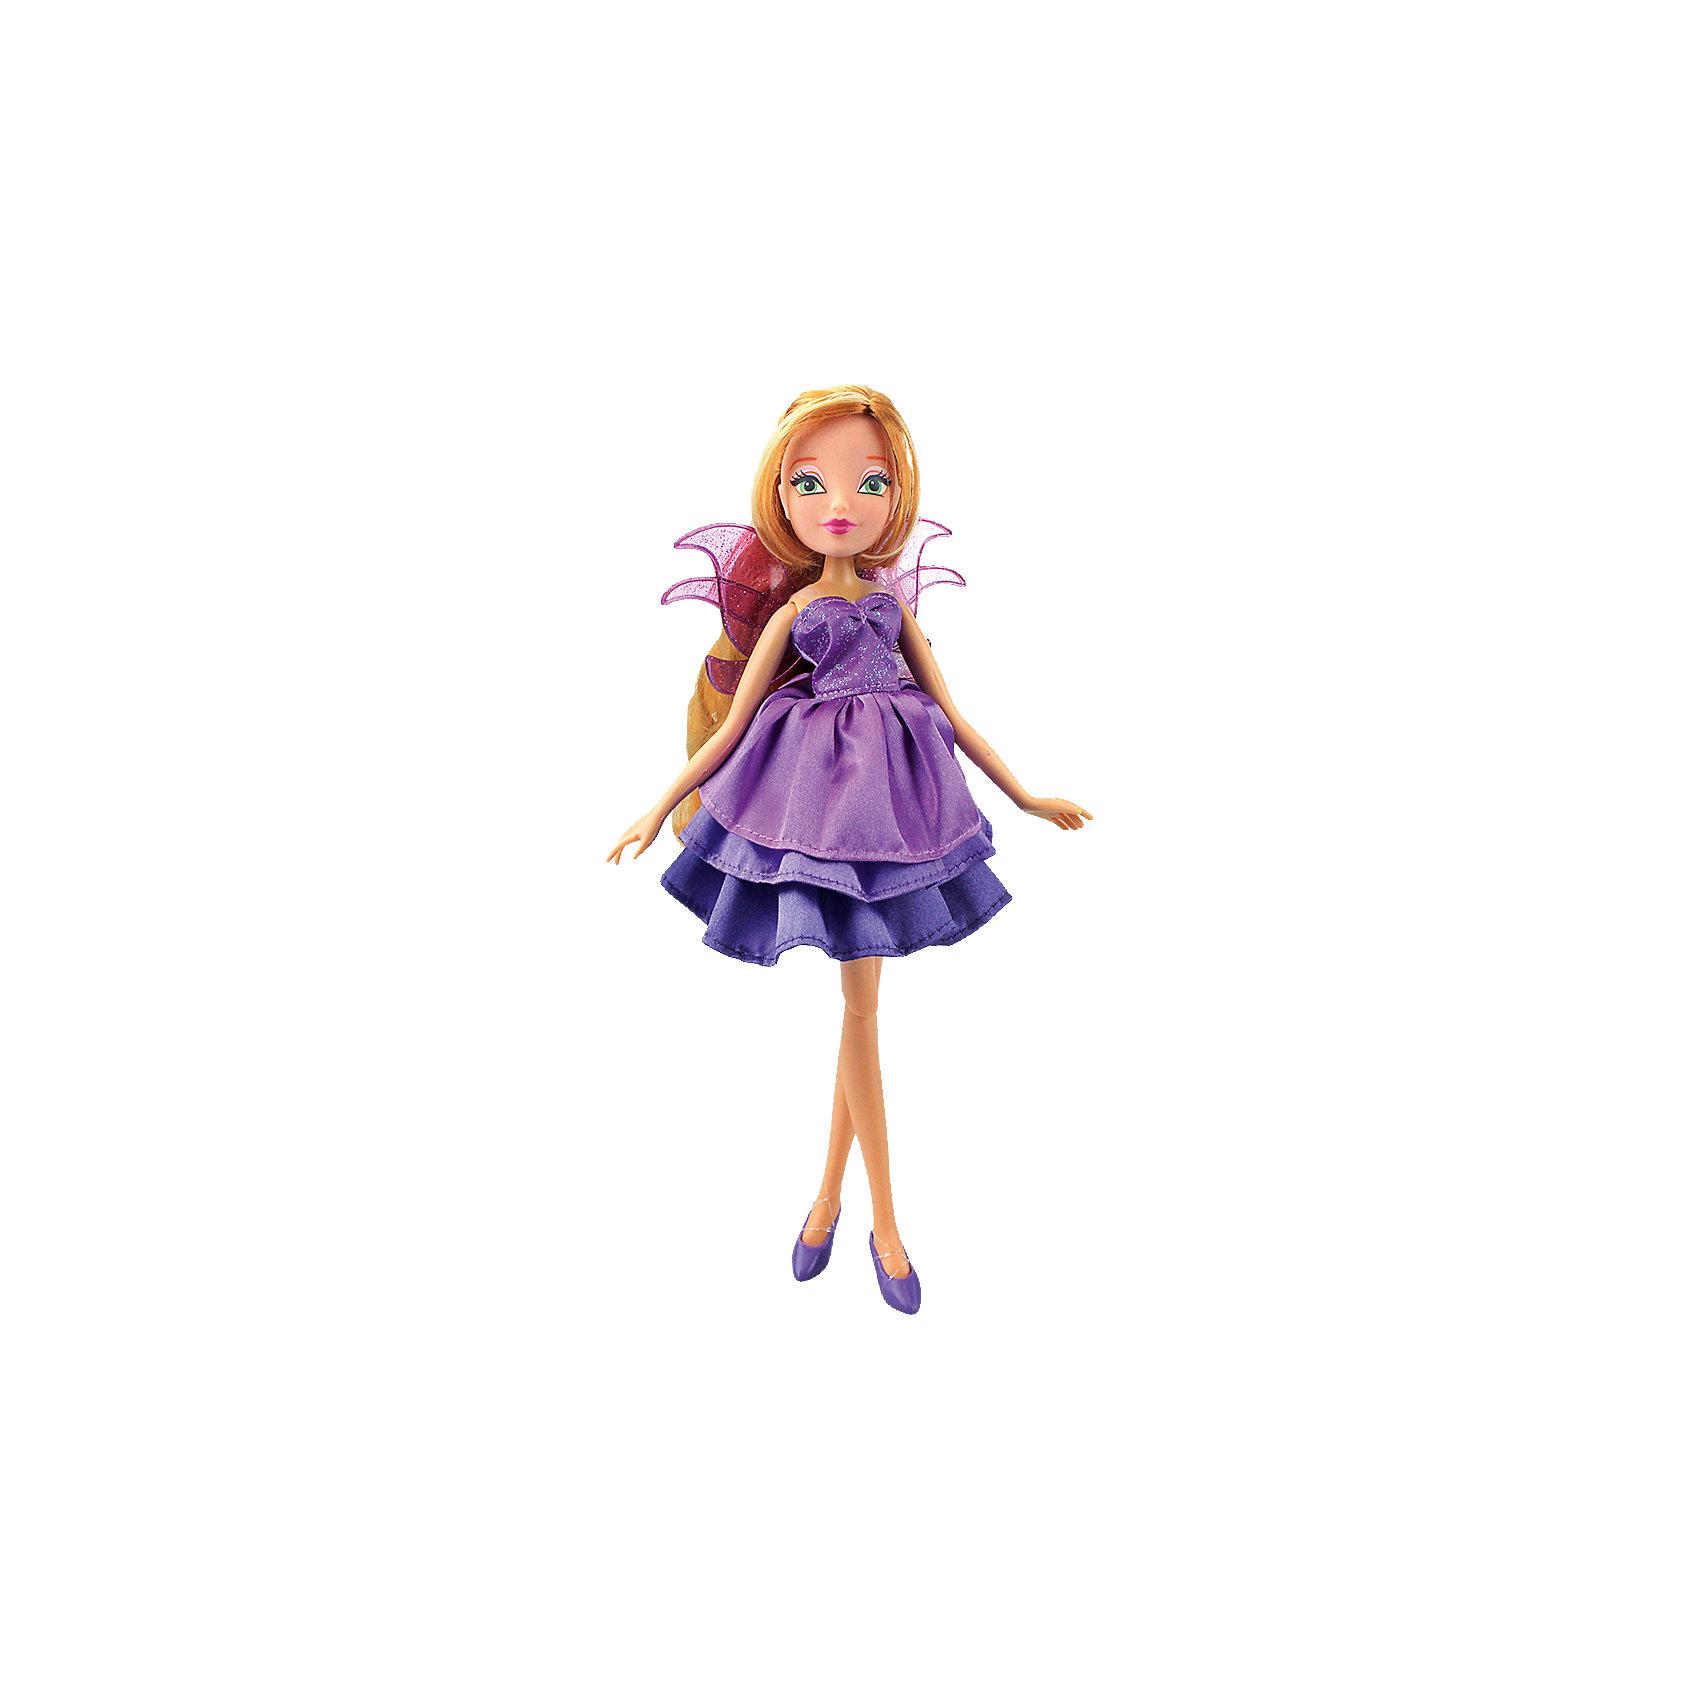 Кукла Флора Волшебное платье, Winx ClubИгрушки<br>Doll Winx Club a Magical dress, Flora<br><br>Ширина мм: 60<br>Глубина мм: 355<br>Высота мм: 210<br>Вес г: 304<br>Возраст от месяцев: 36<br>Возраст до месяцев: 120<br>Пол: Женский<br>Возраст: Детский<br>SKU: 5532626